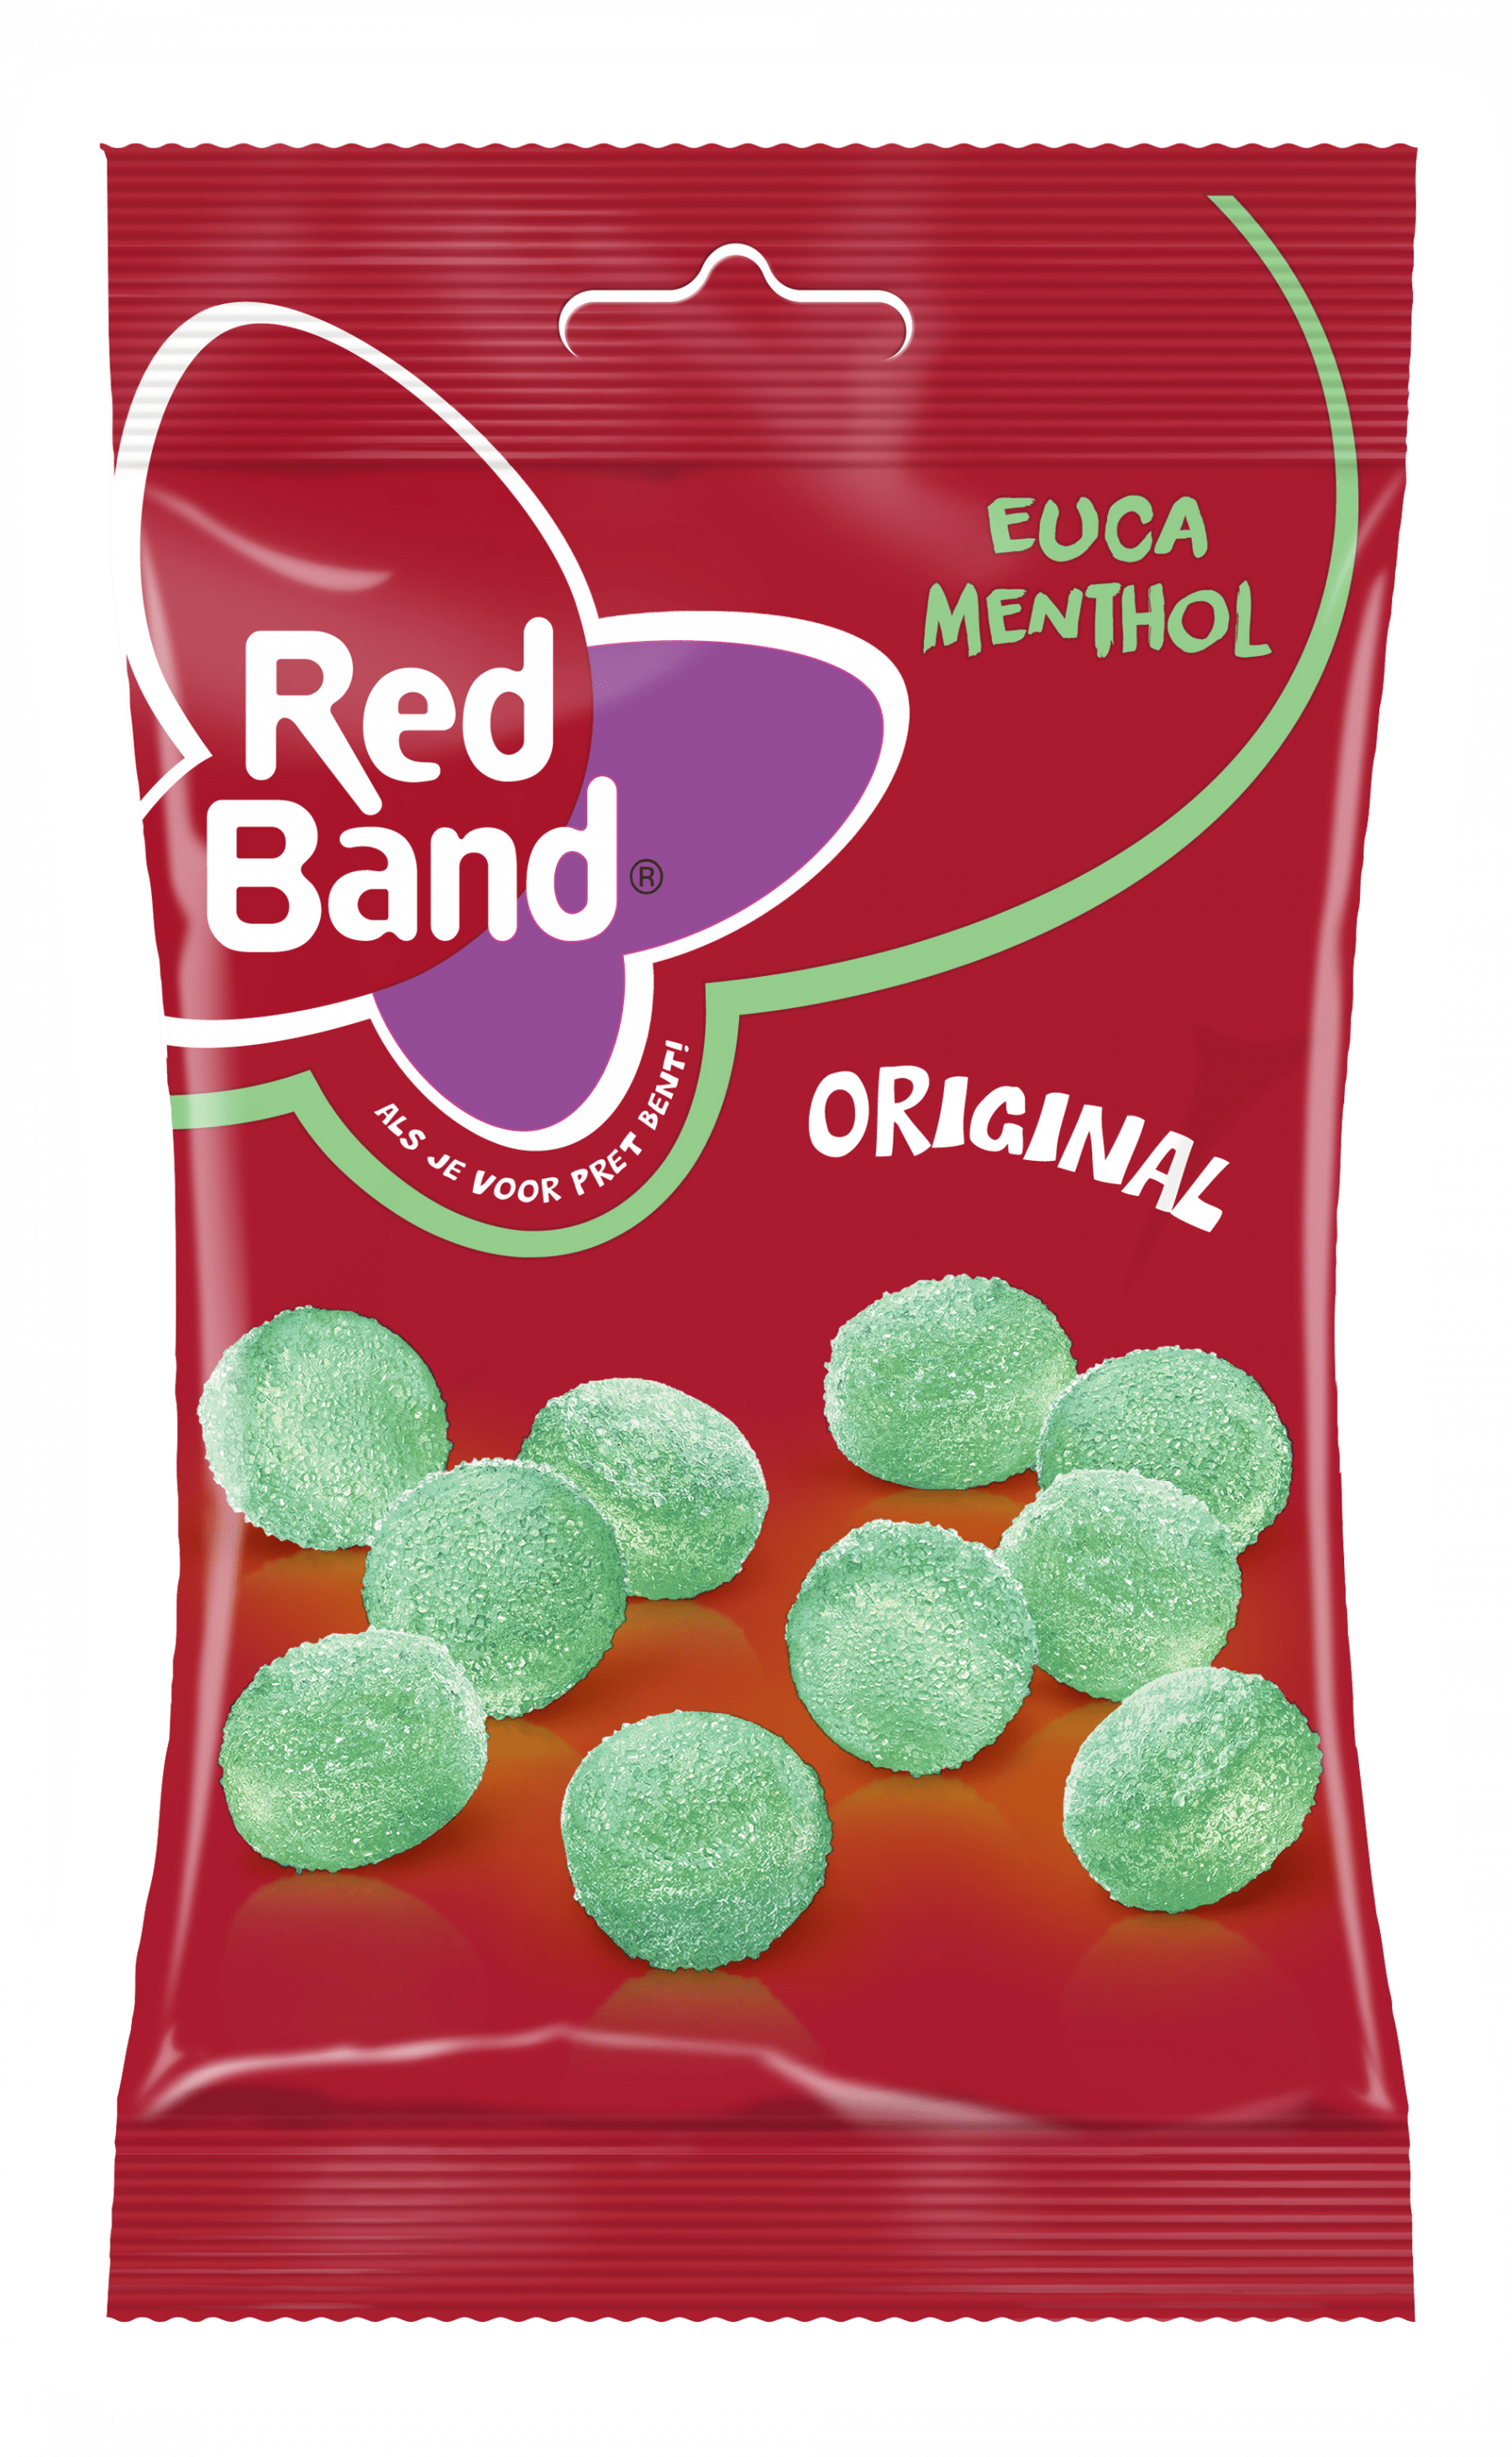 Red Band | Euca- Menthol | 12 stuks